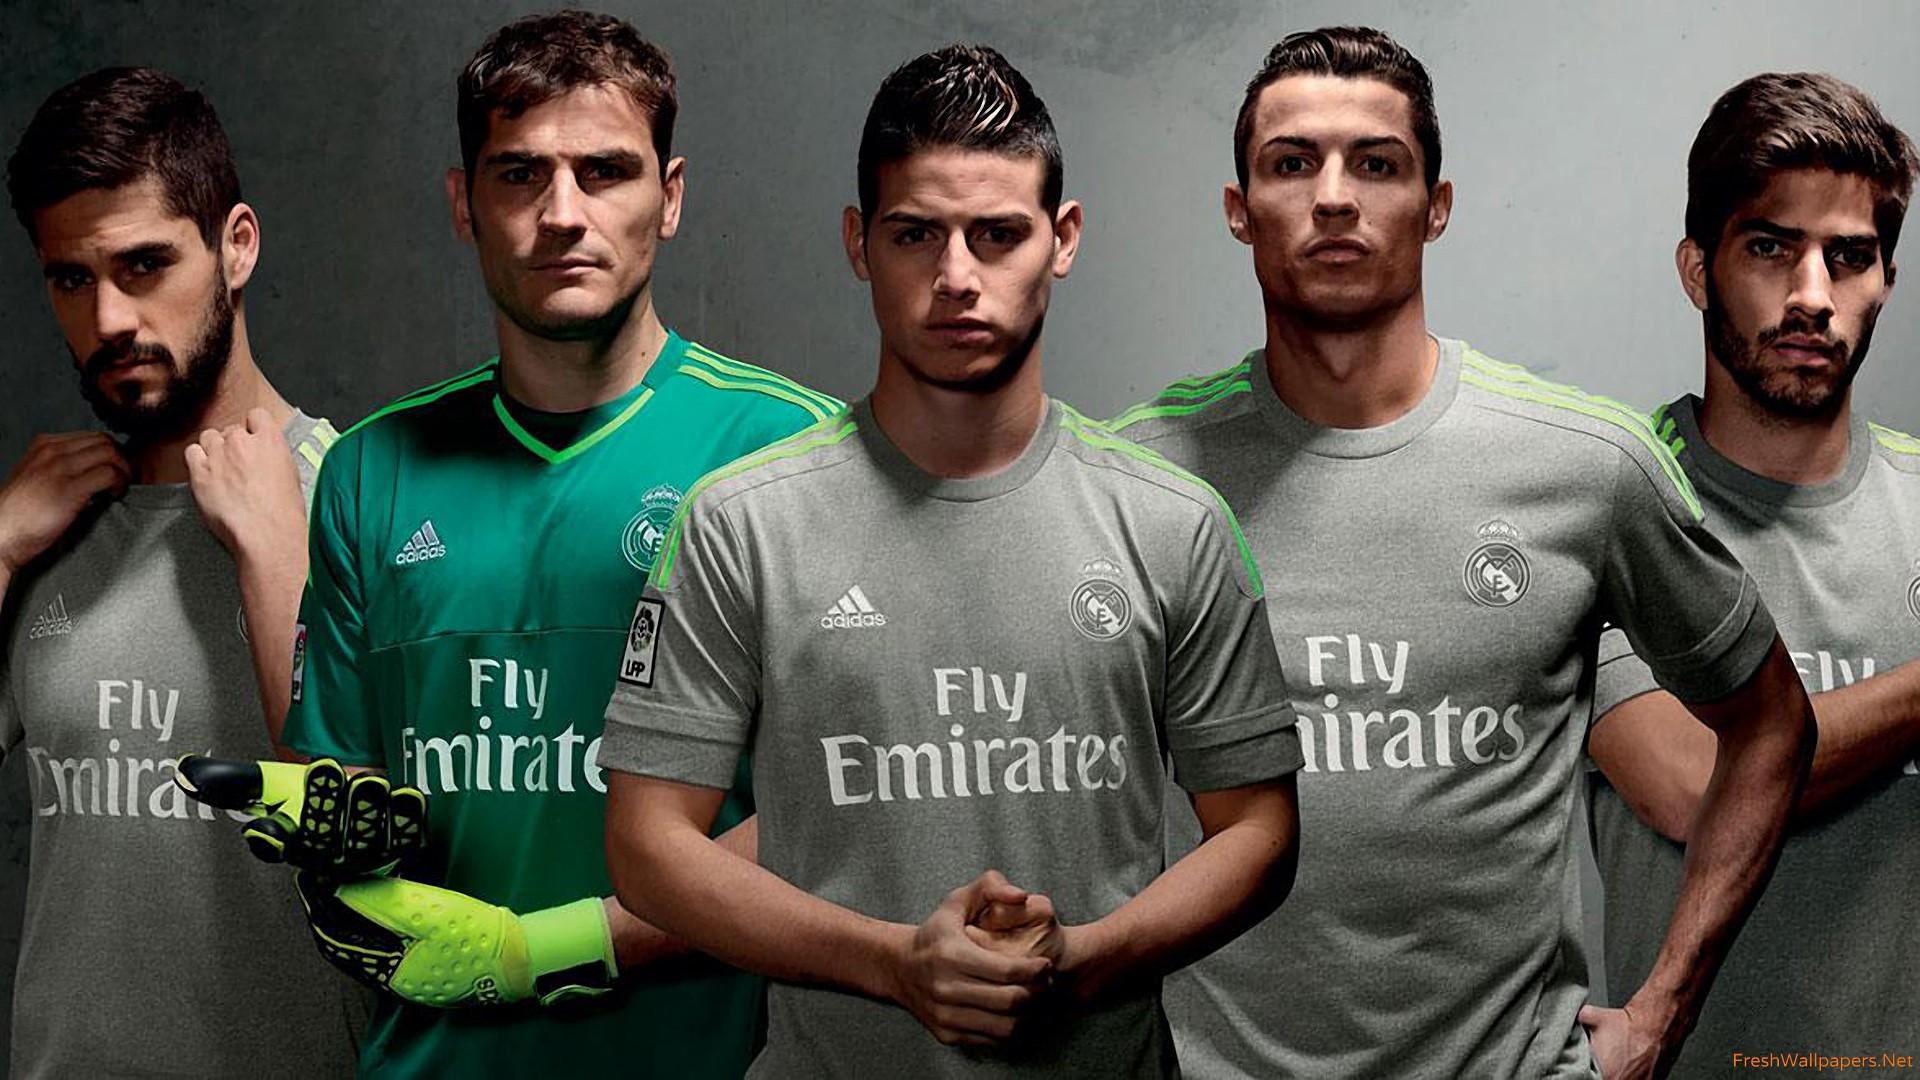 Real Madrid CF 2015 2016 Adidas Away Kit wallpapers Freshwallpapers 1920x1080